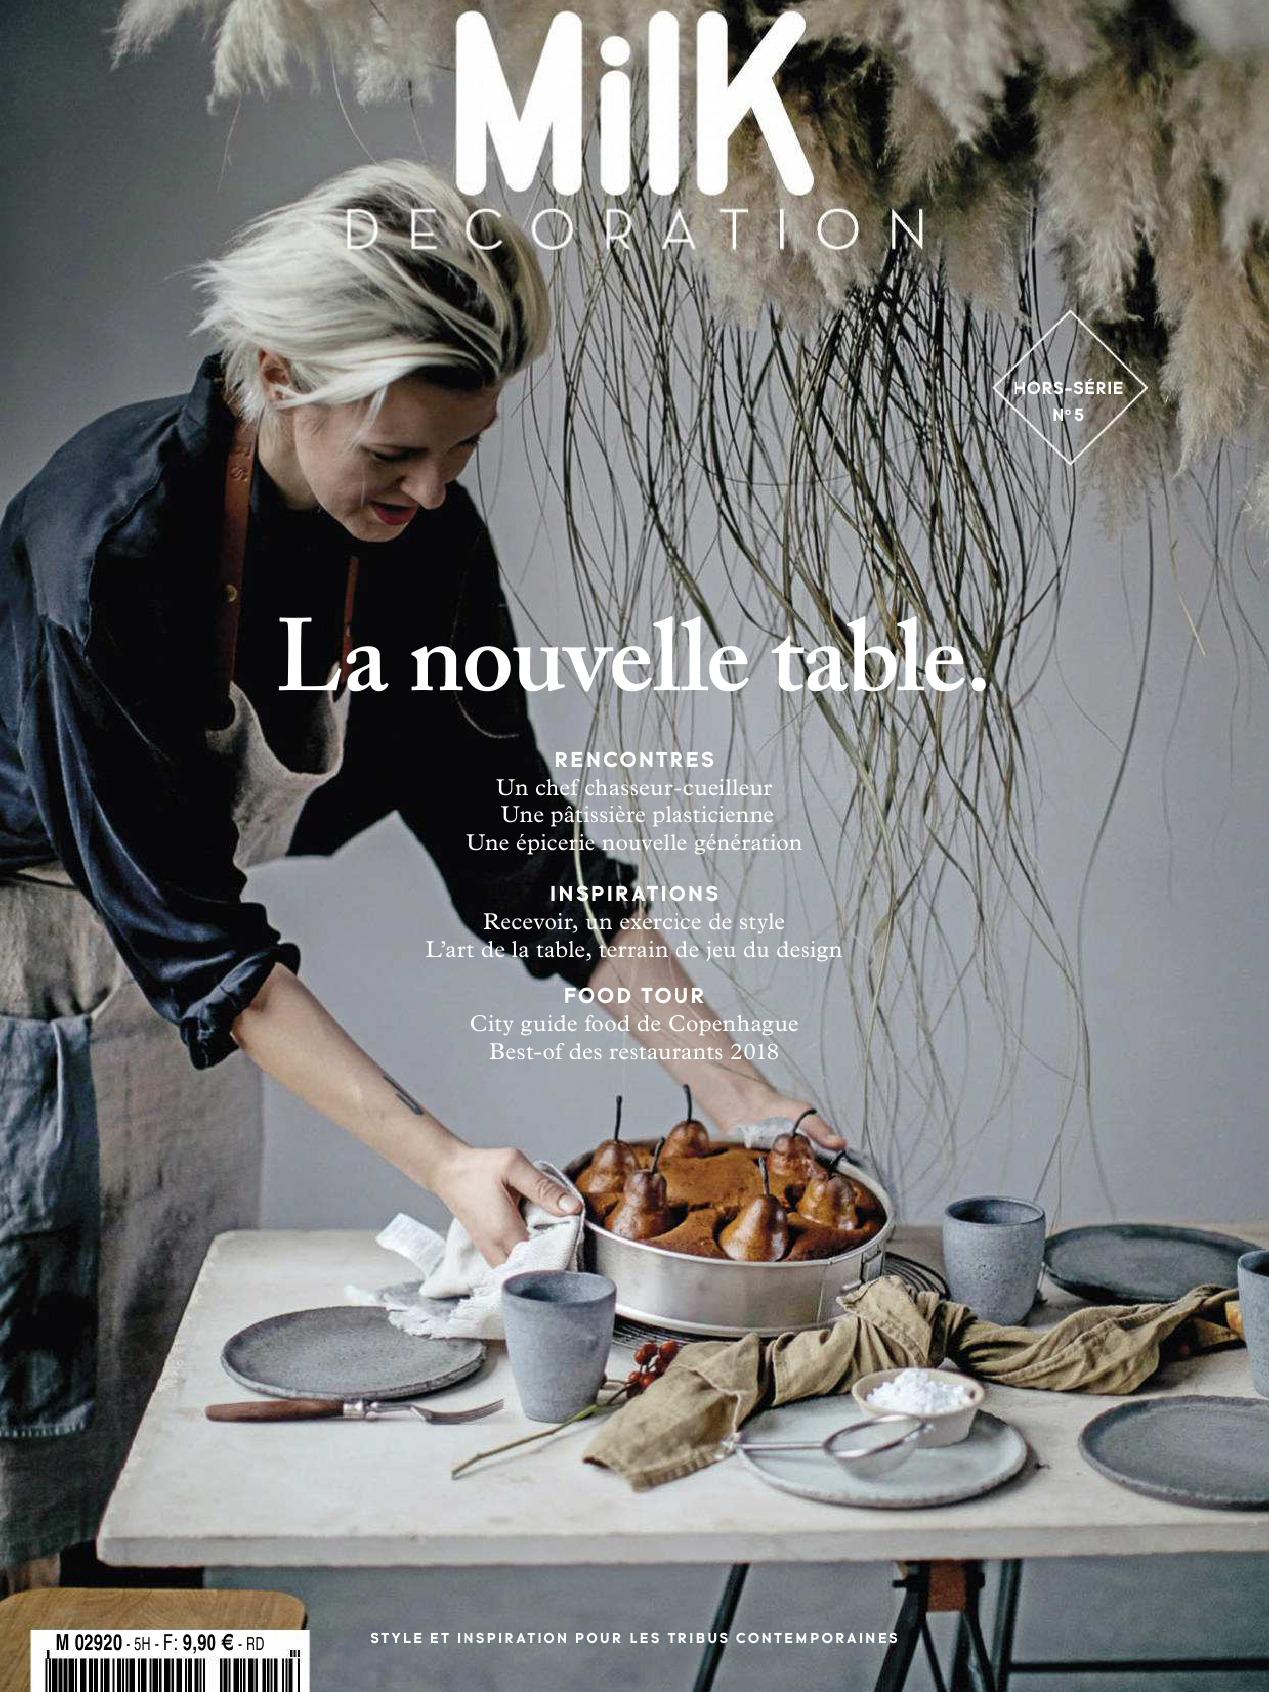 《Milk Decoration》法国家庭生活杂志2018-19年秋冬号